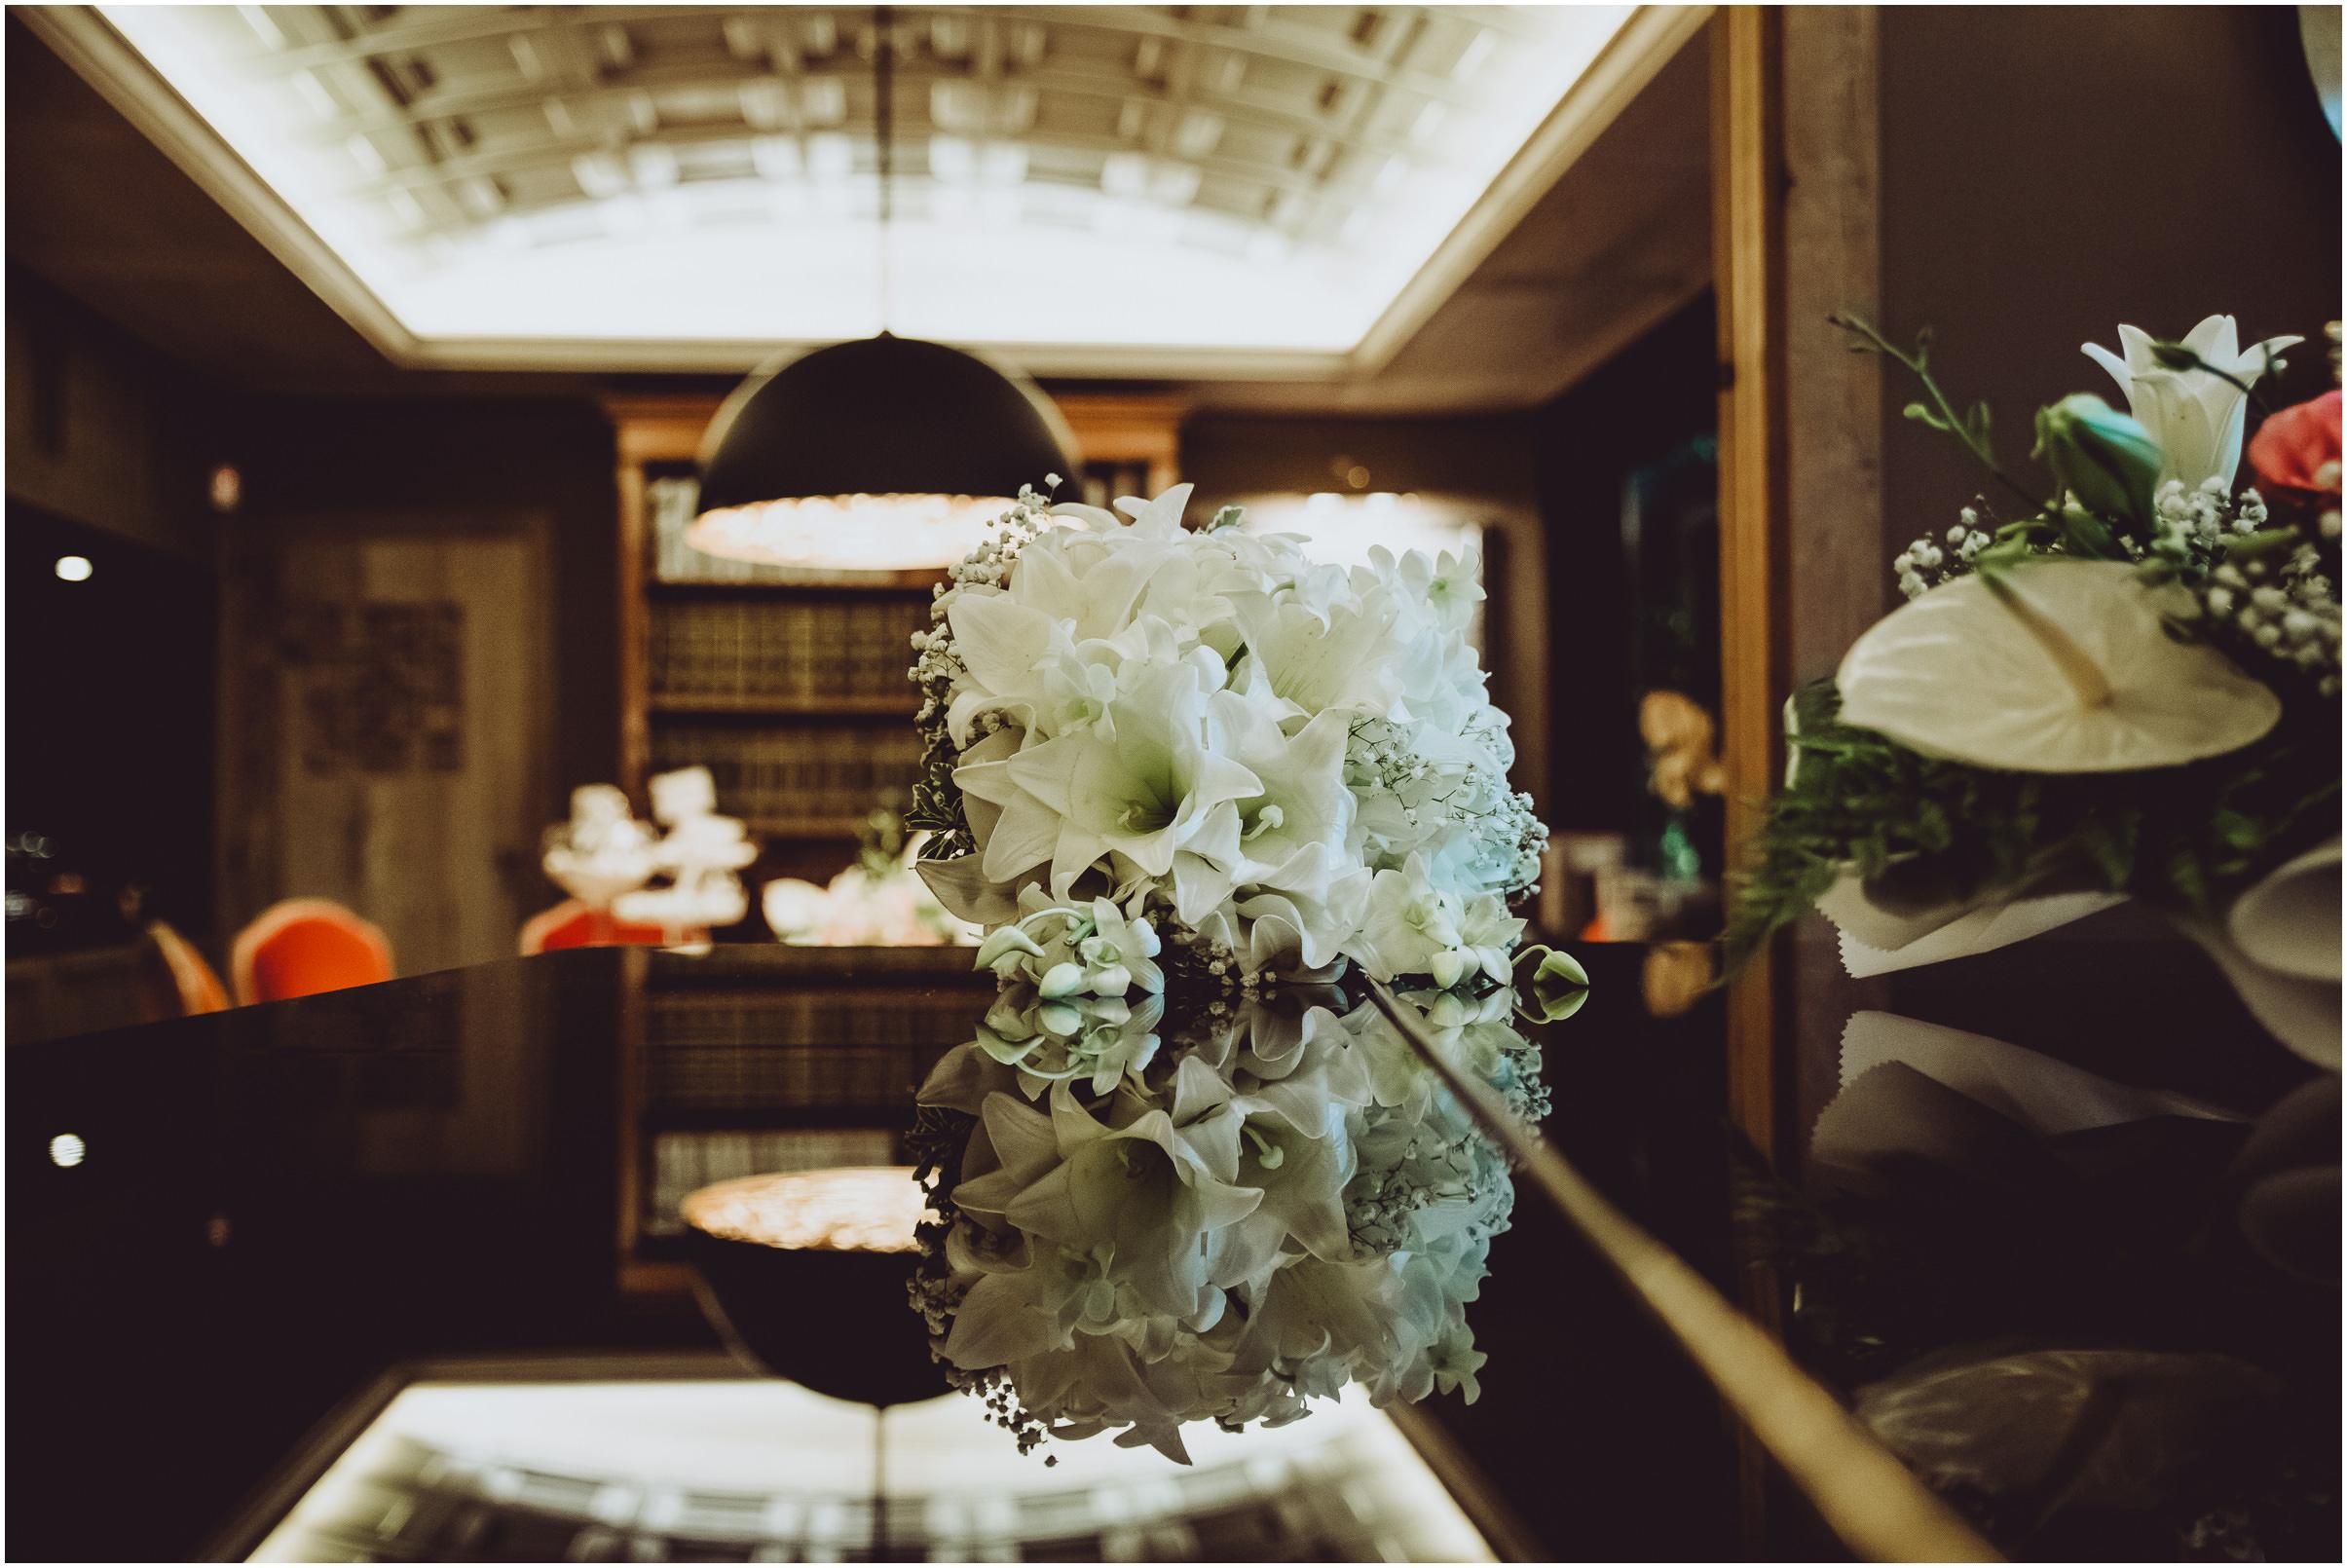 WEDDING-PHOTOGRAPHY-SARA-LORENZONI-FOTOGRAFIA-MATRIMONIO-ORVIETO-JUKA-ANTONELLO68